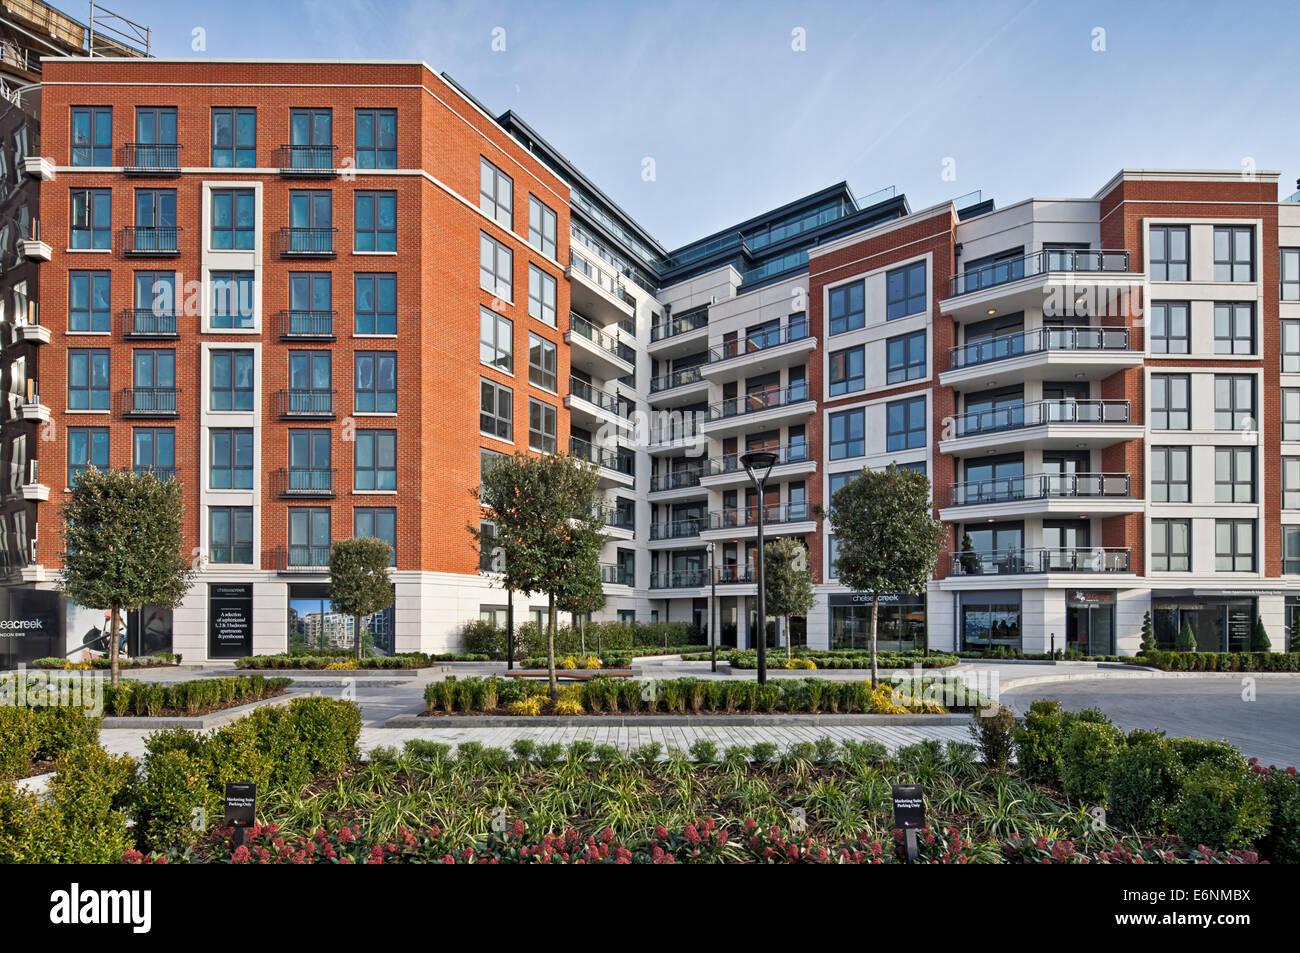 Chelsea Creek Luxury Apartments In London.   Stock Image